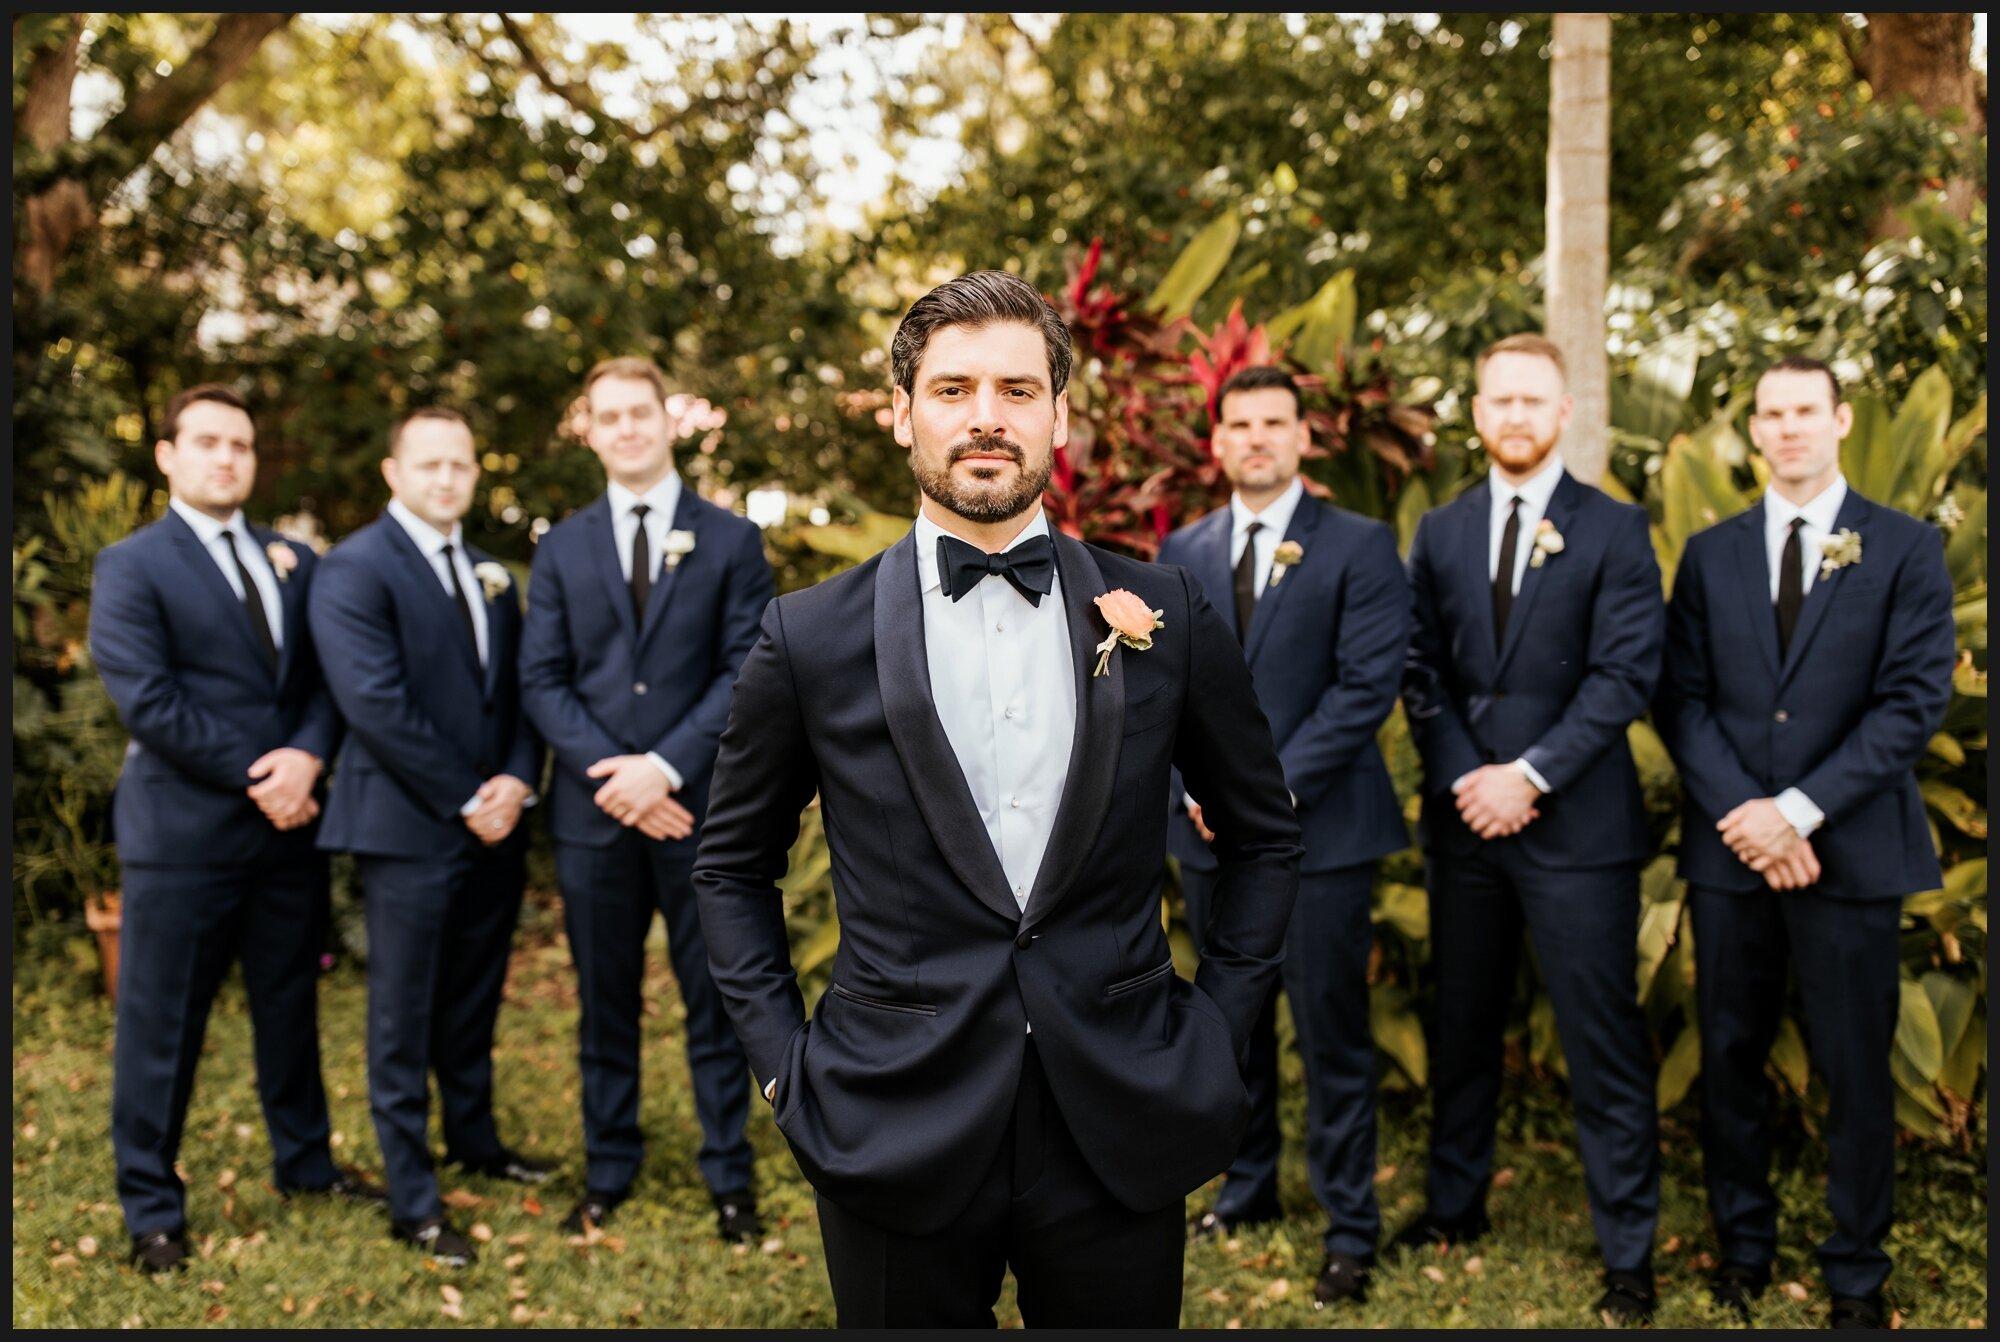 Orlando-Wedding-Photographer-destination-wedding-photographer-florida-wedding-photographer-hawaii-wedding-photographer_0744.jpg